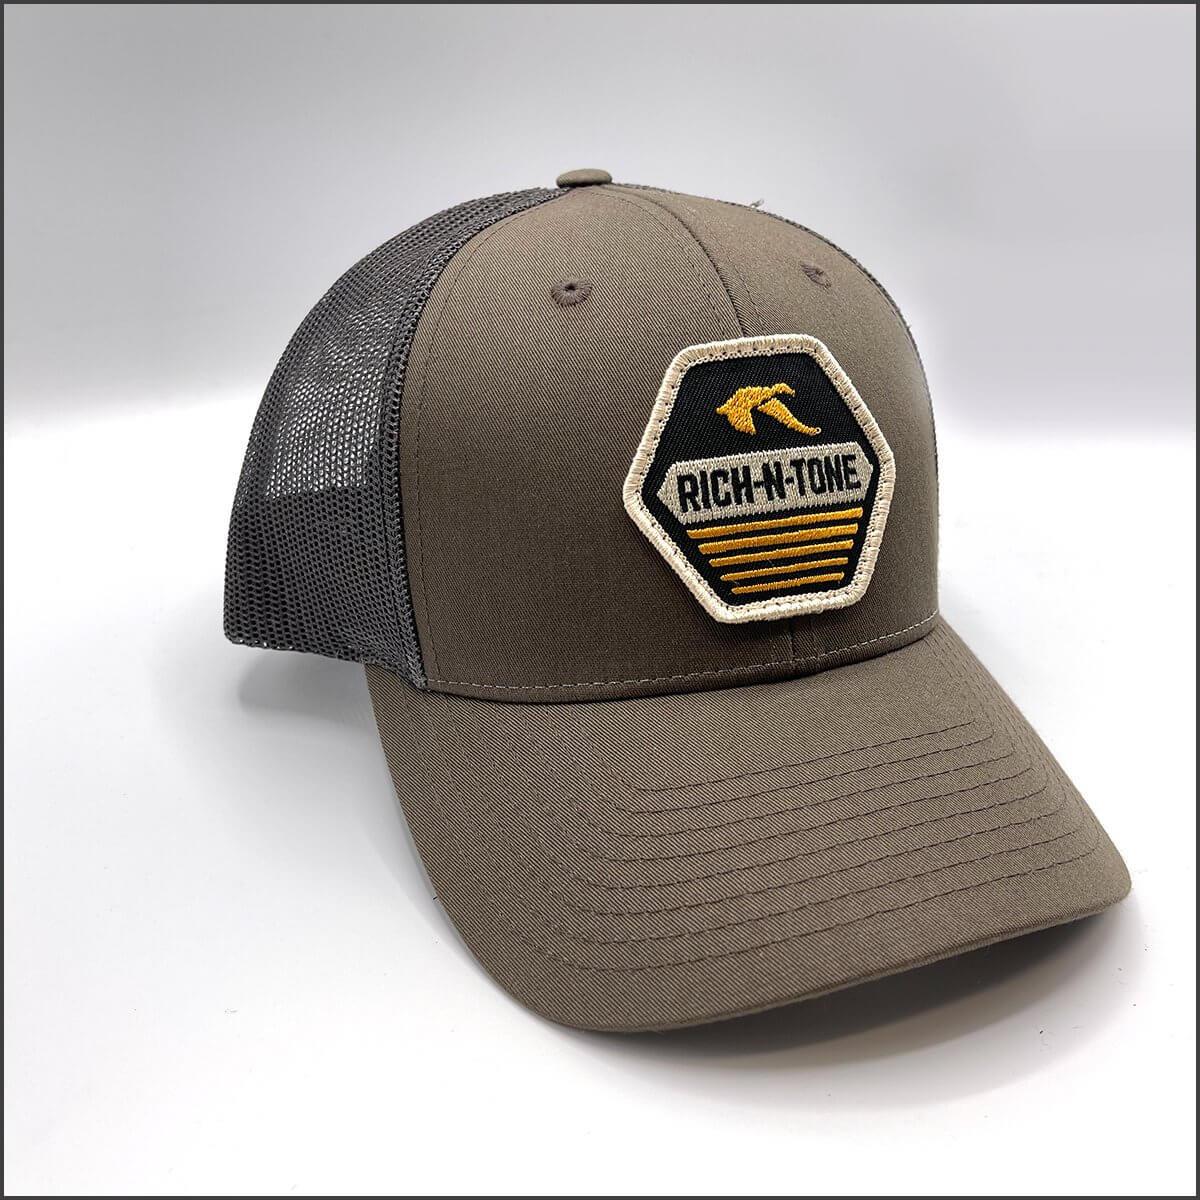 Rich N Tone Calls octagon hat